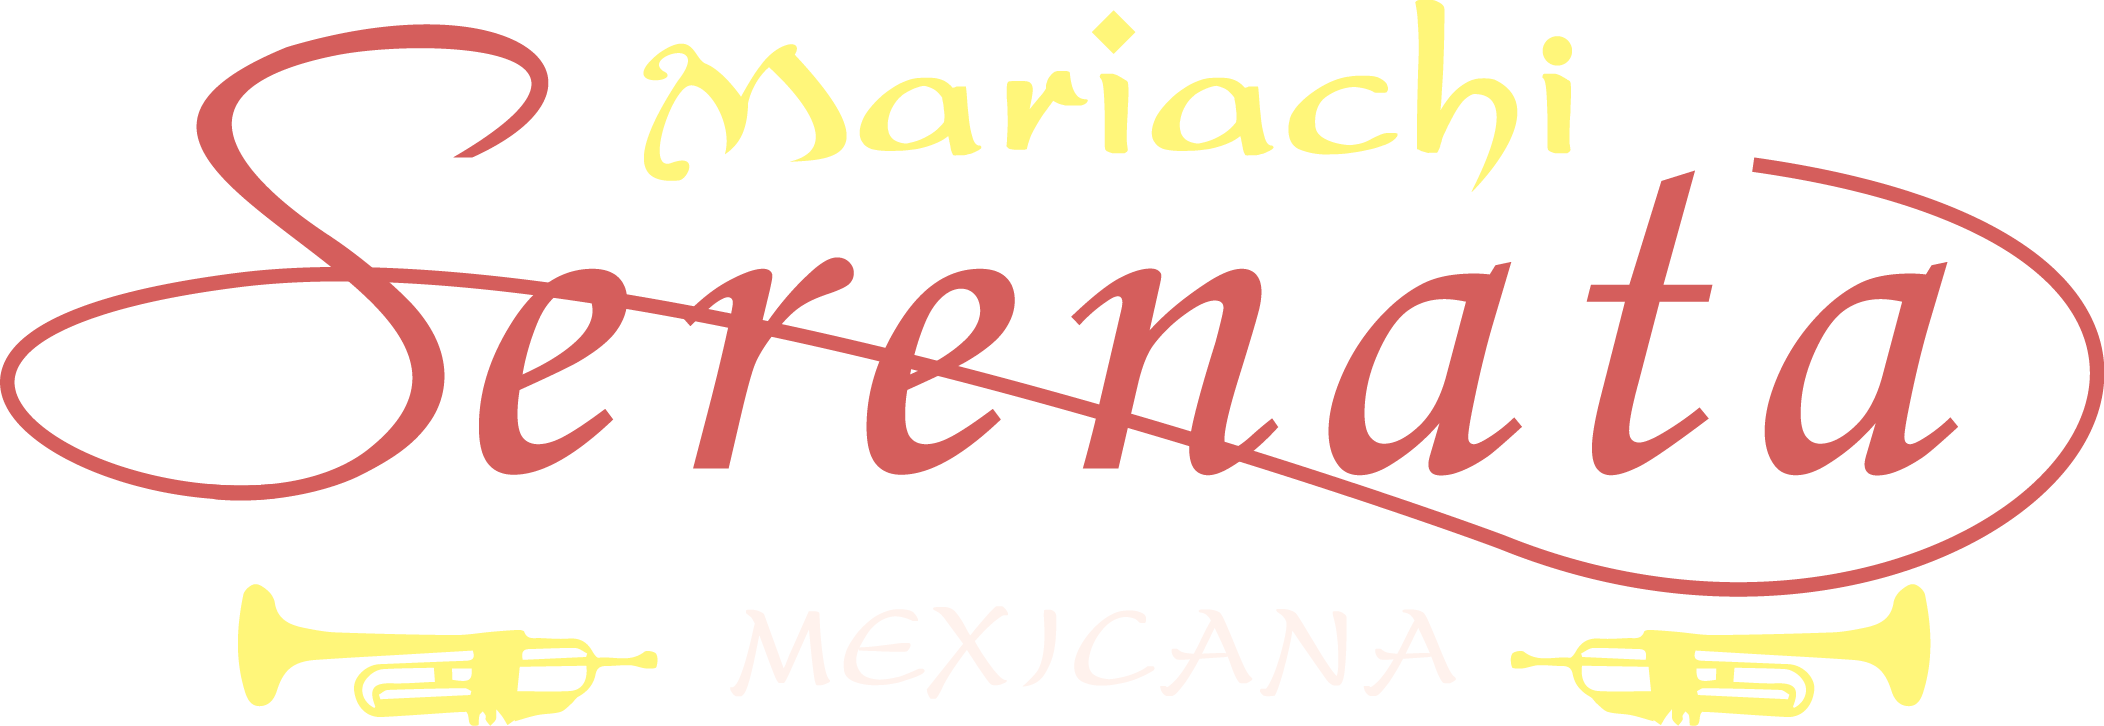 Mariachi Serenata Mexicana